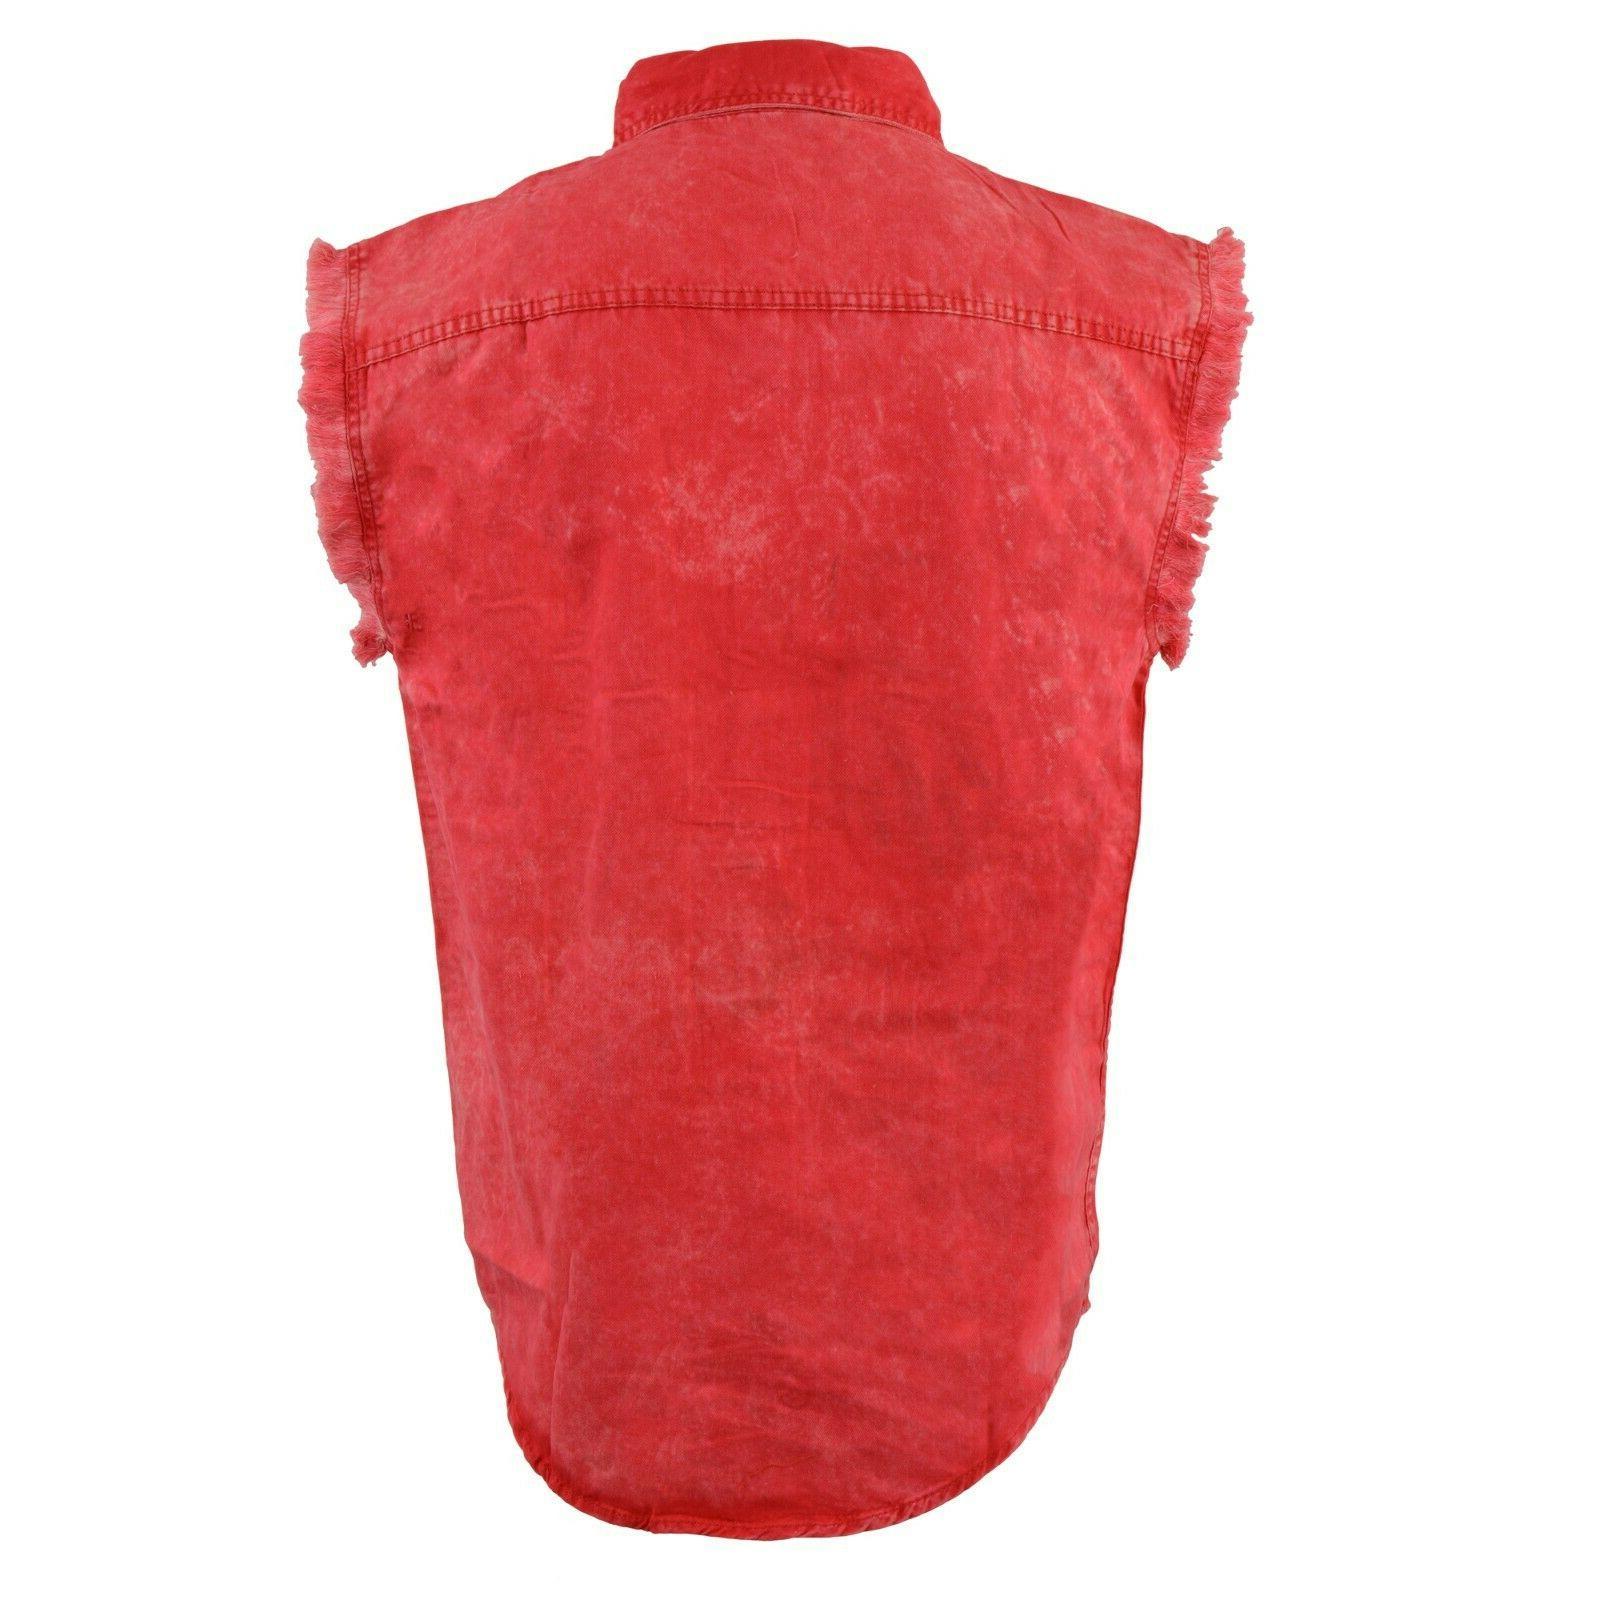 Biker Clothing Men's and Beige Shirt**MDM11681